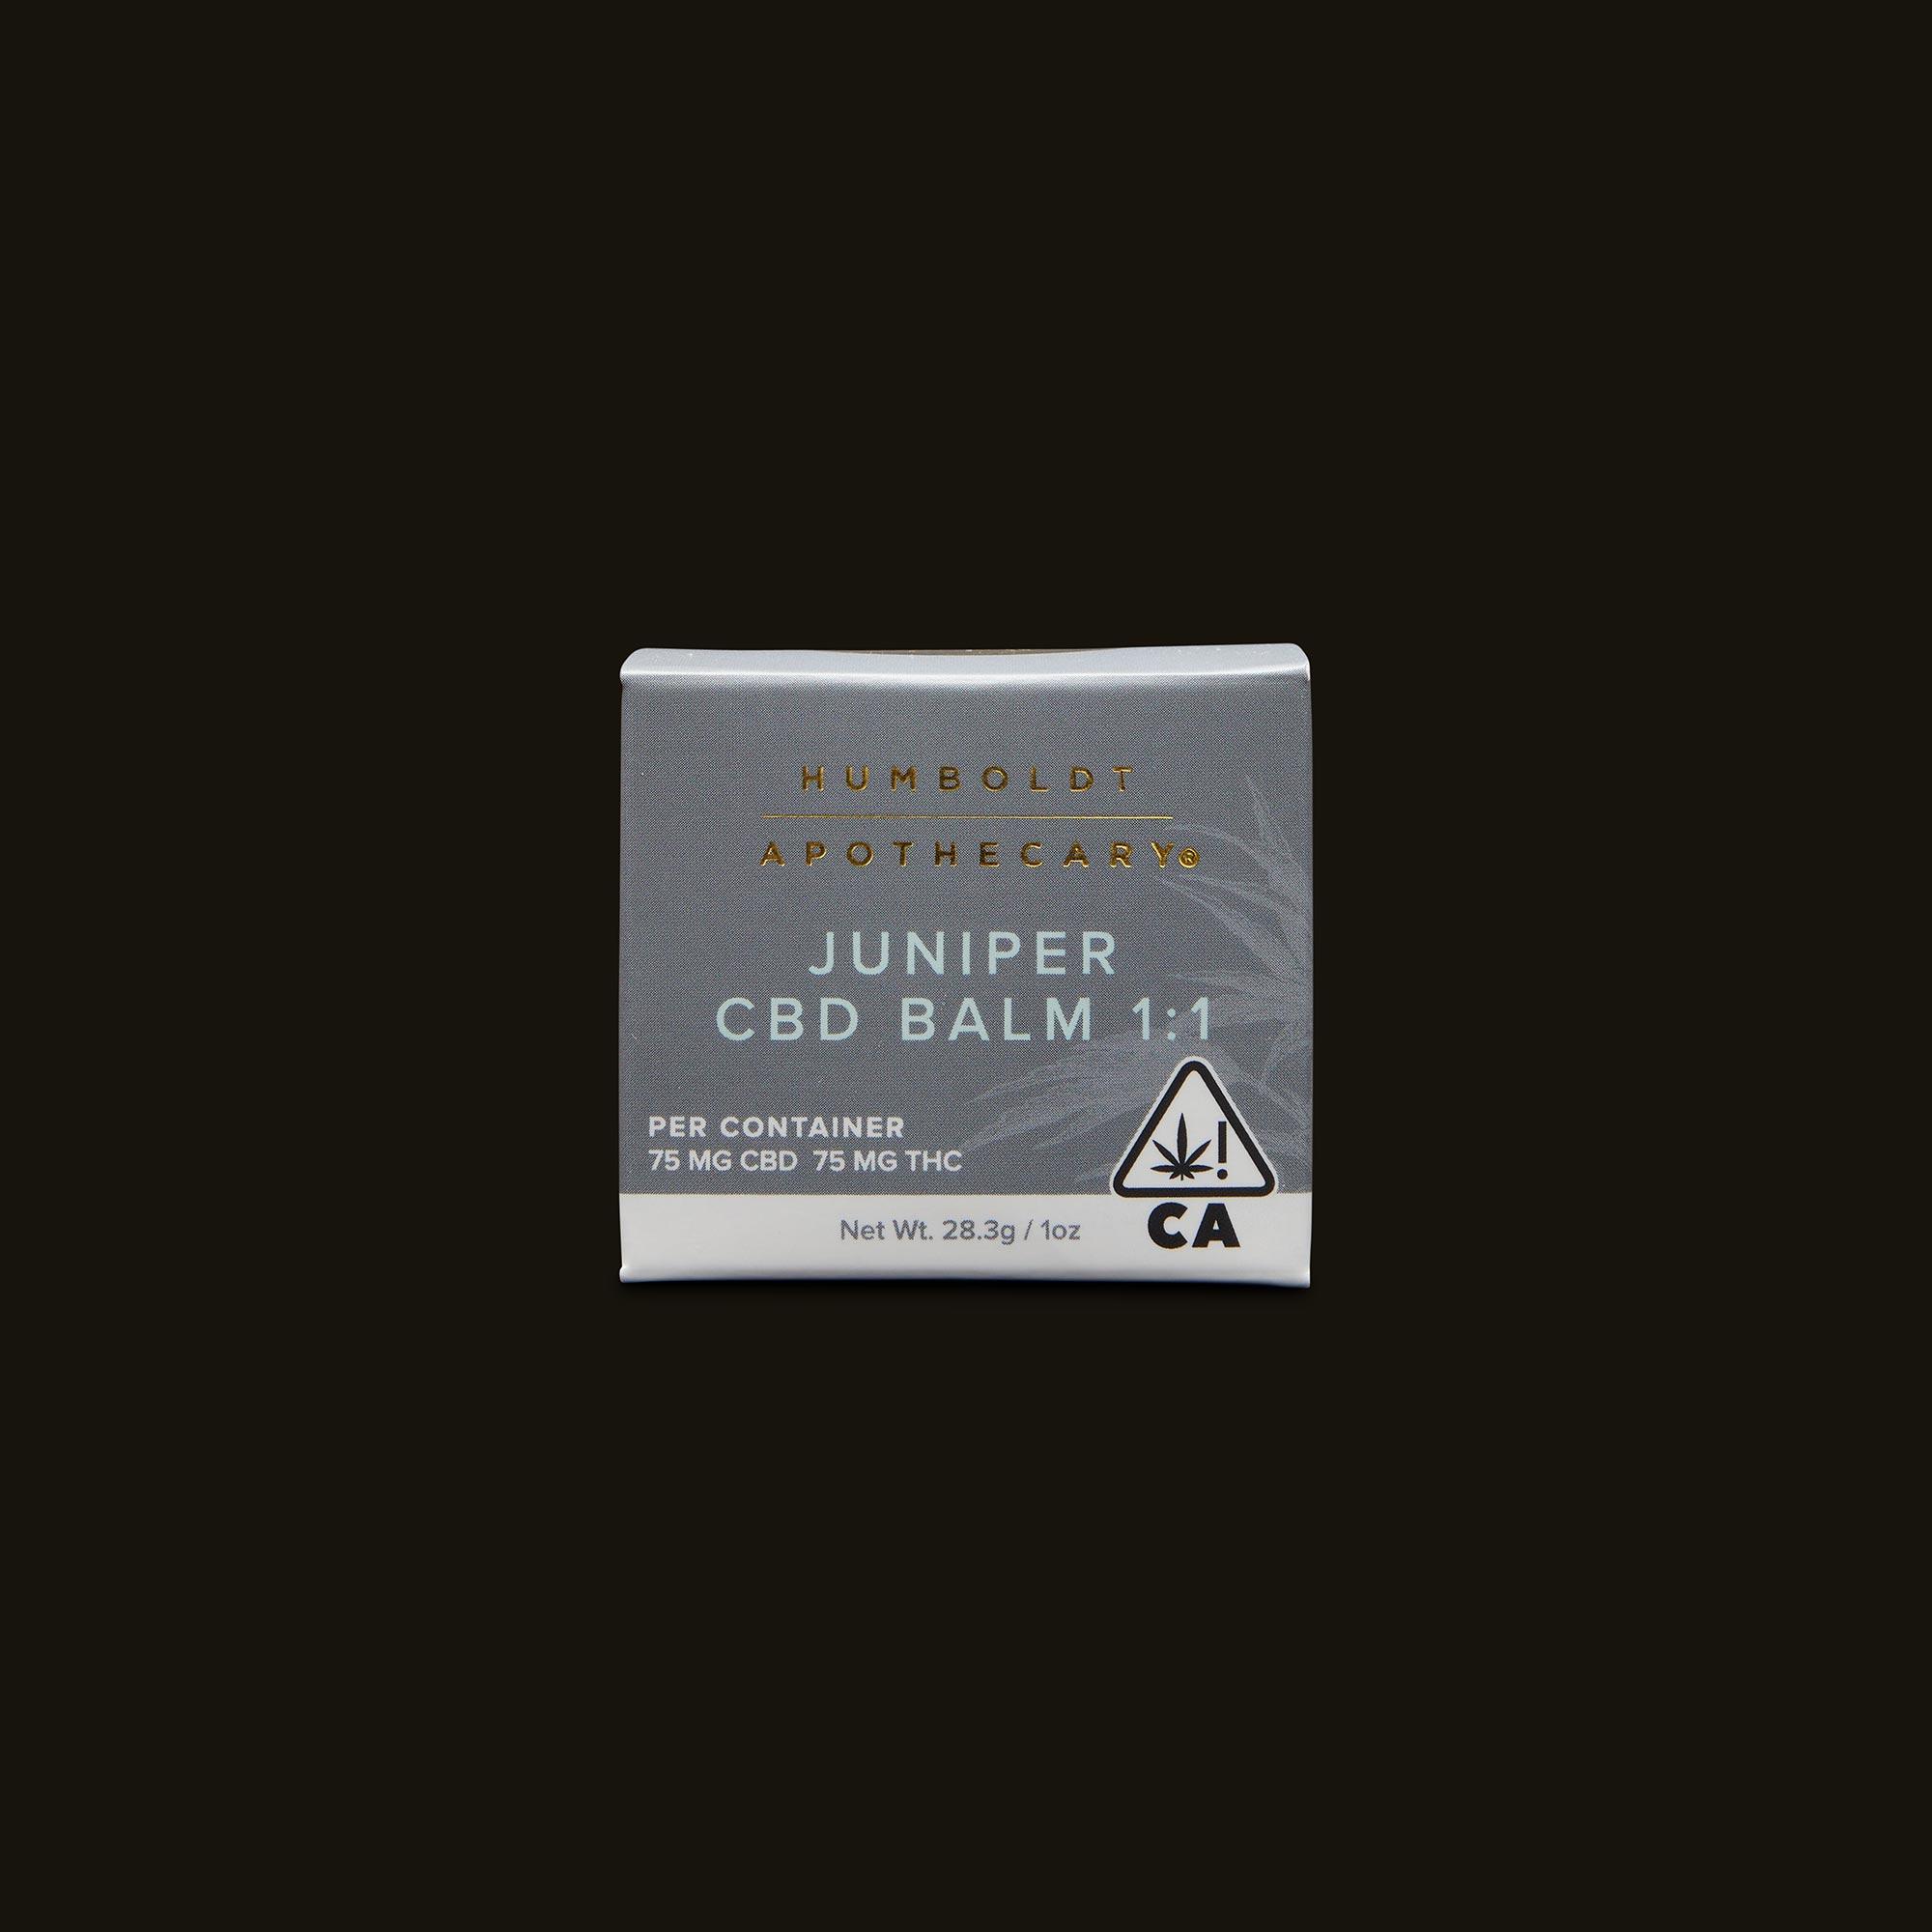 Humboldt Apothecary Juniper CBD Balm Front Packaging